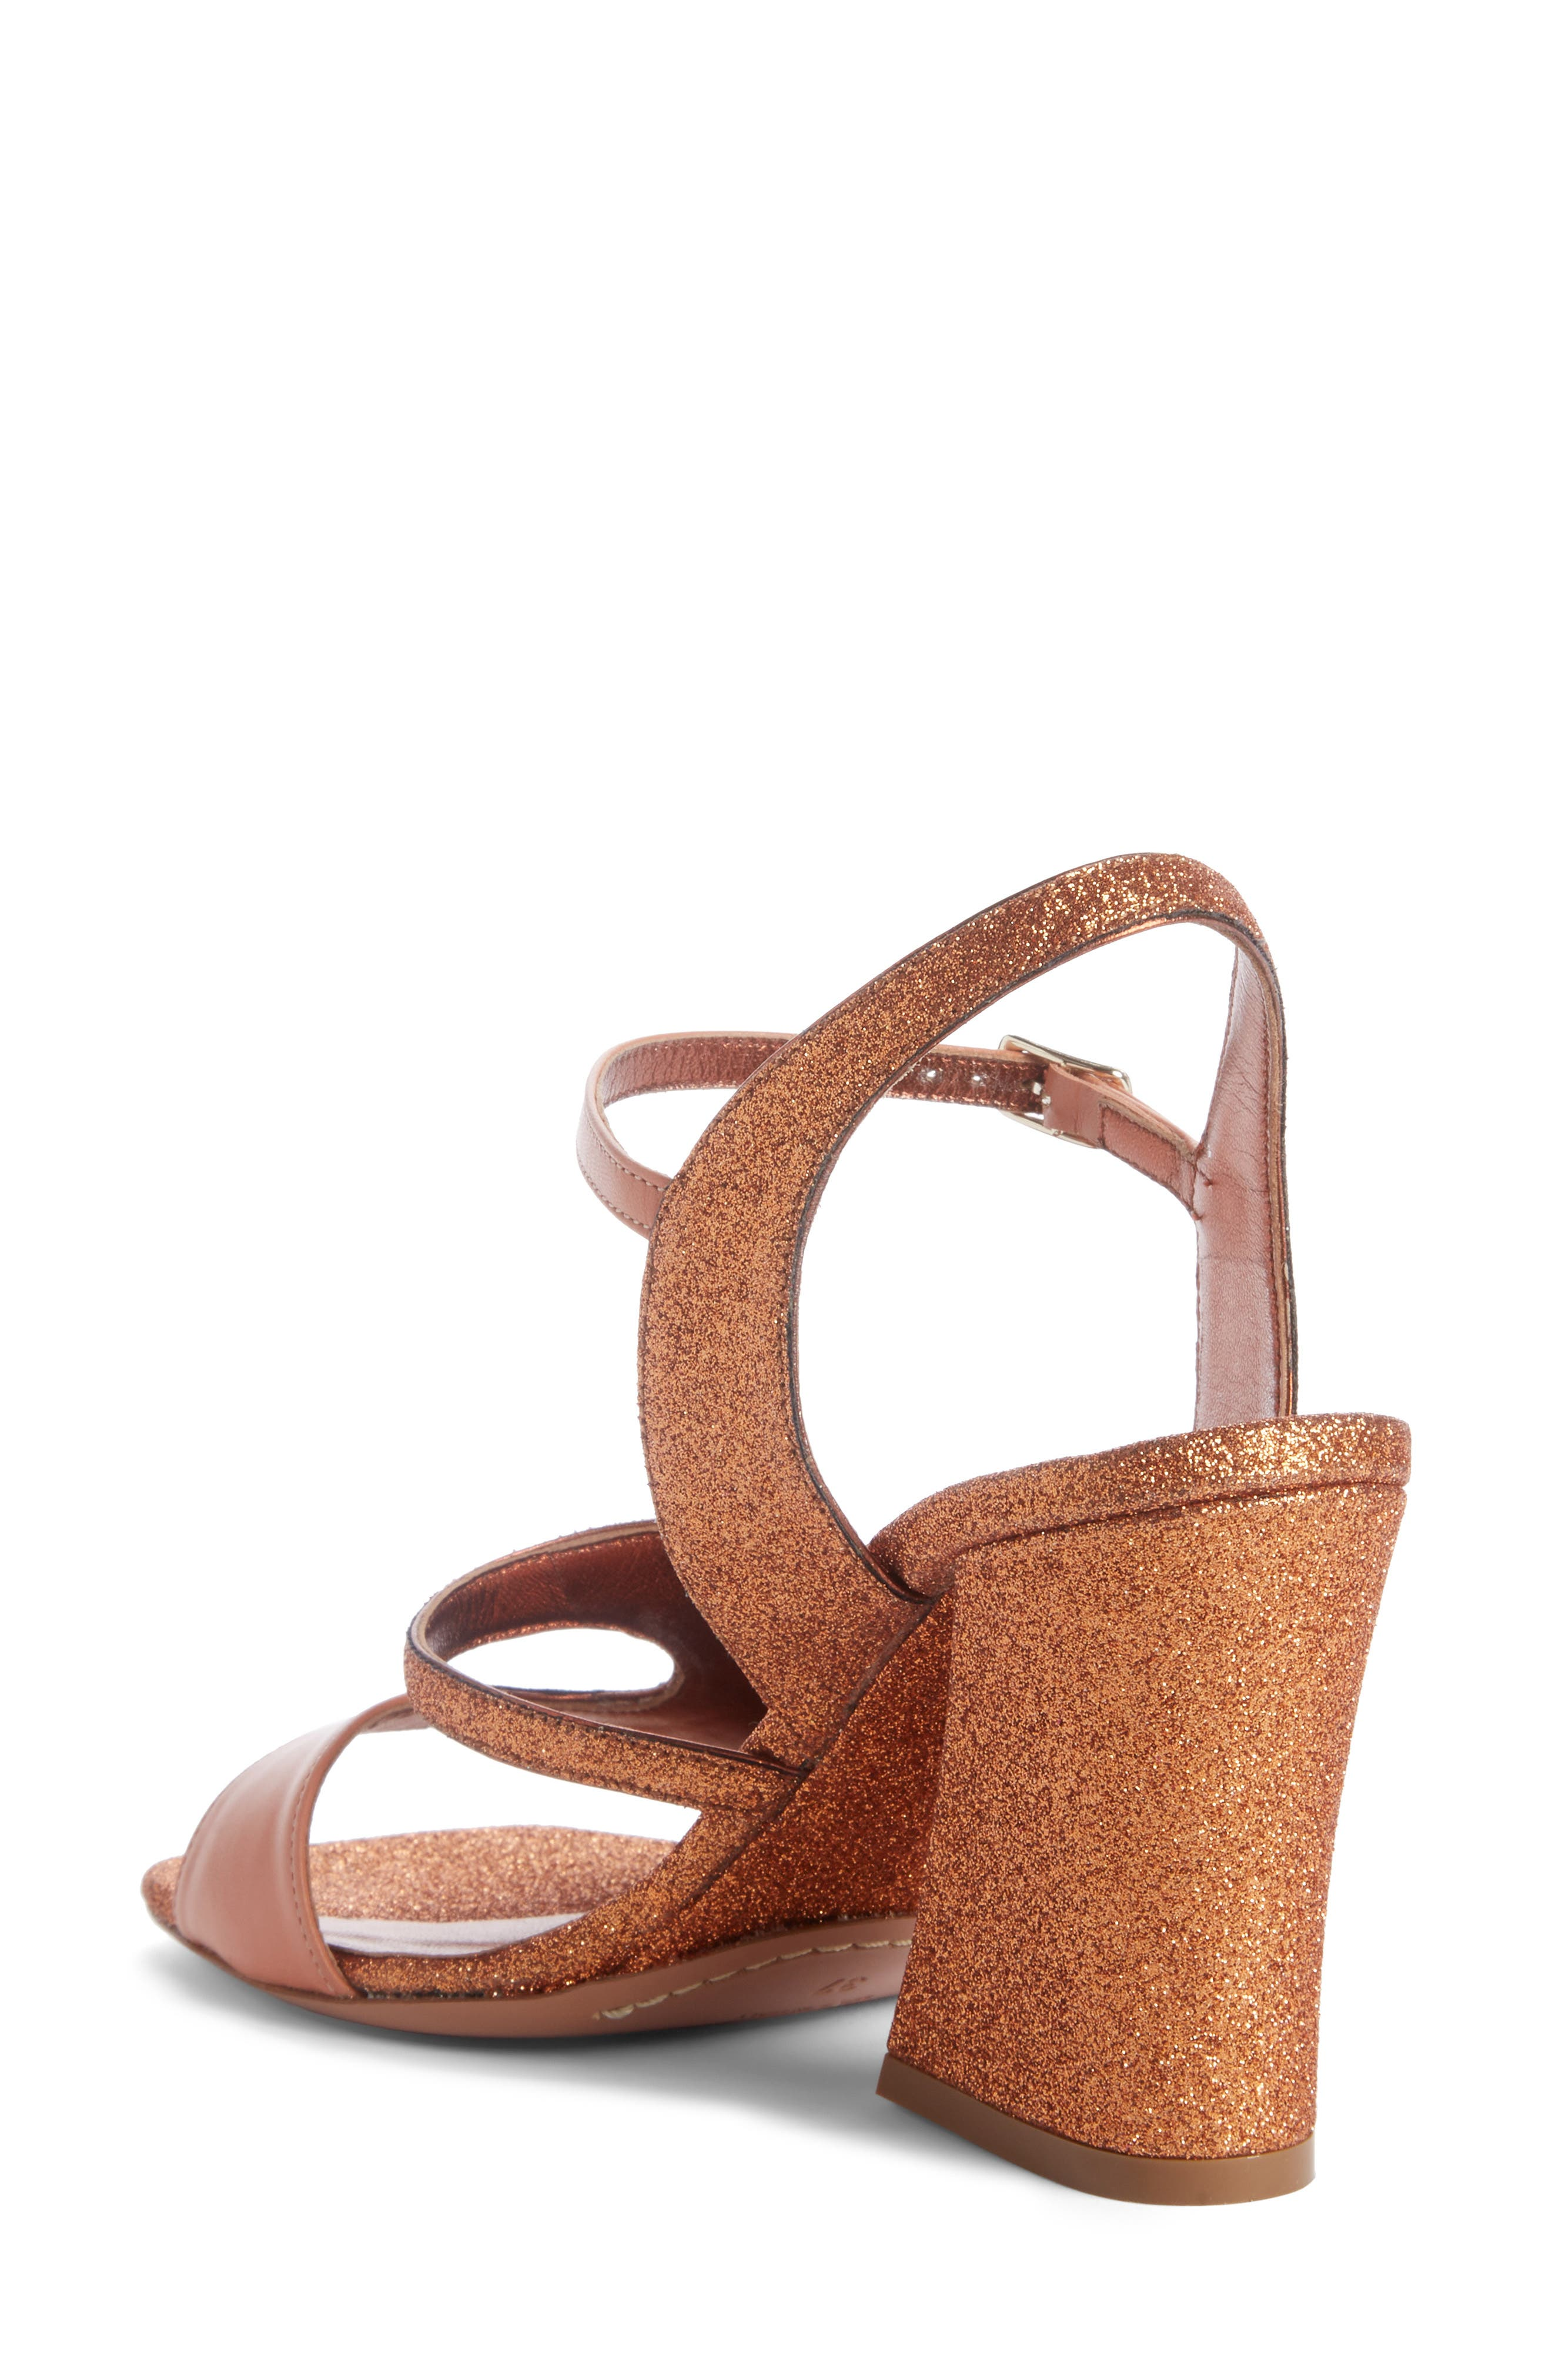 Ankle Strap Sandal,                             Alternate thumbnail 2, color,